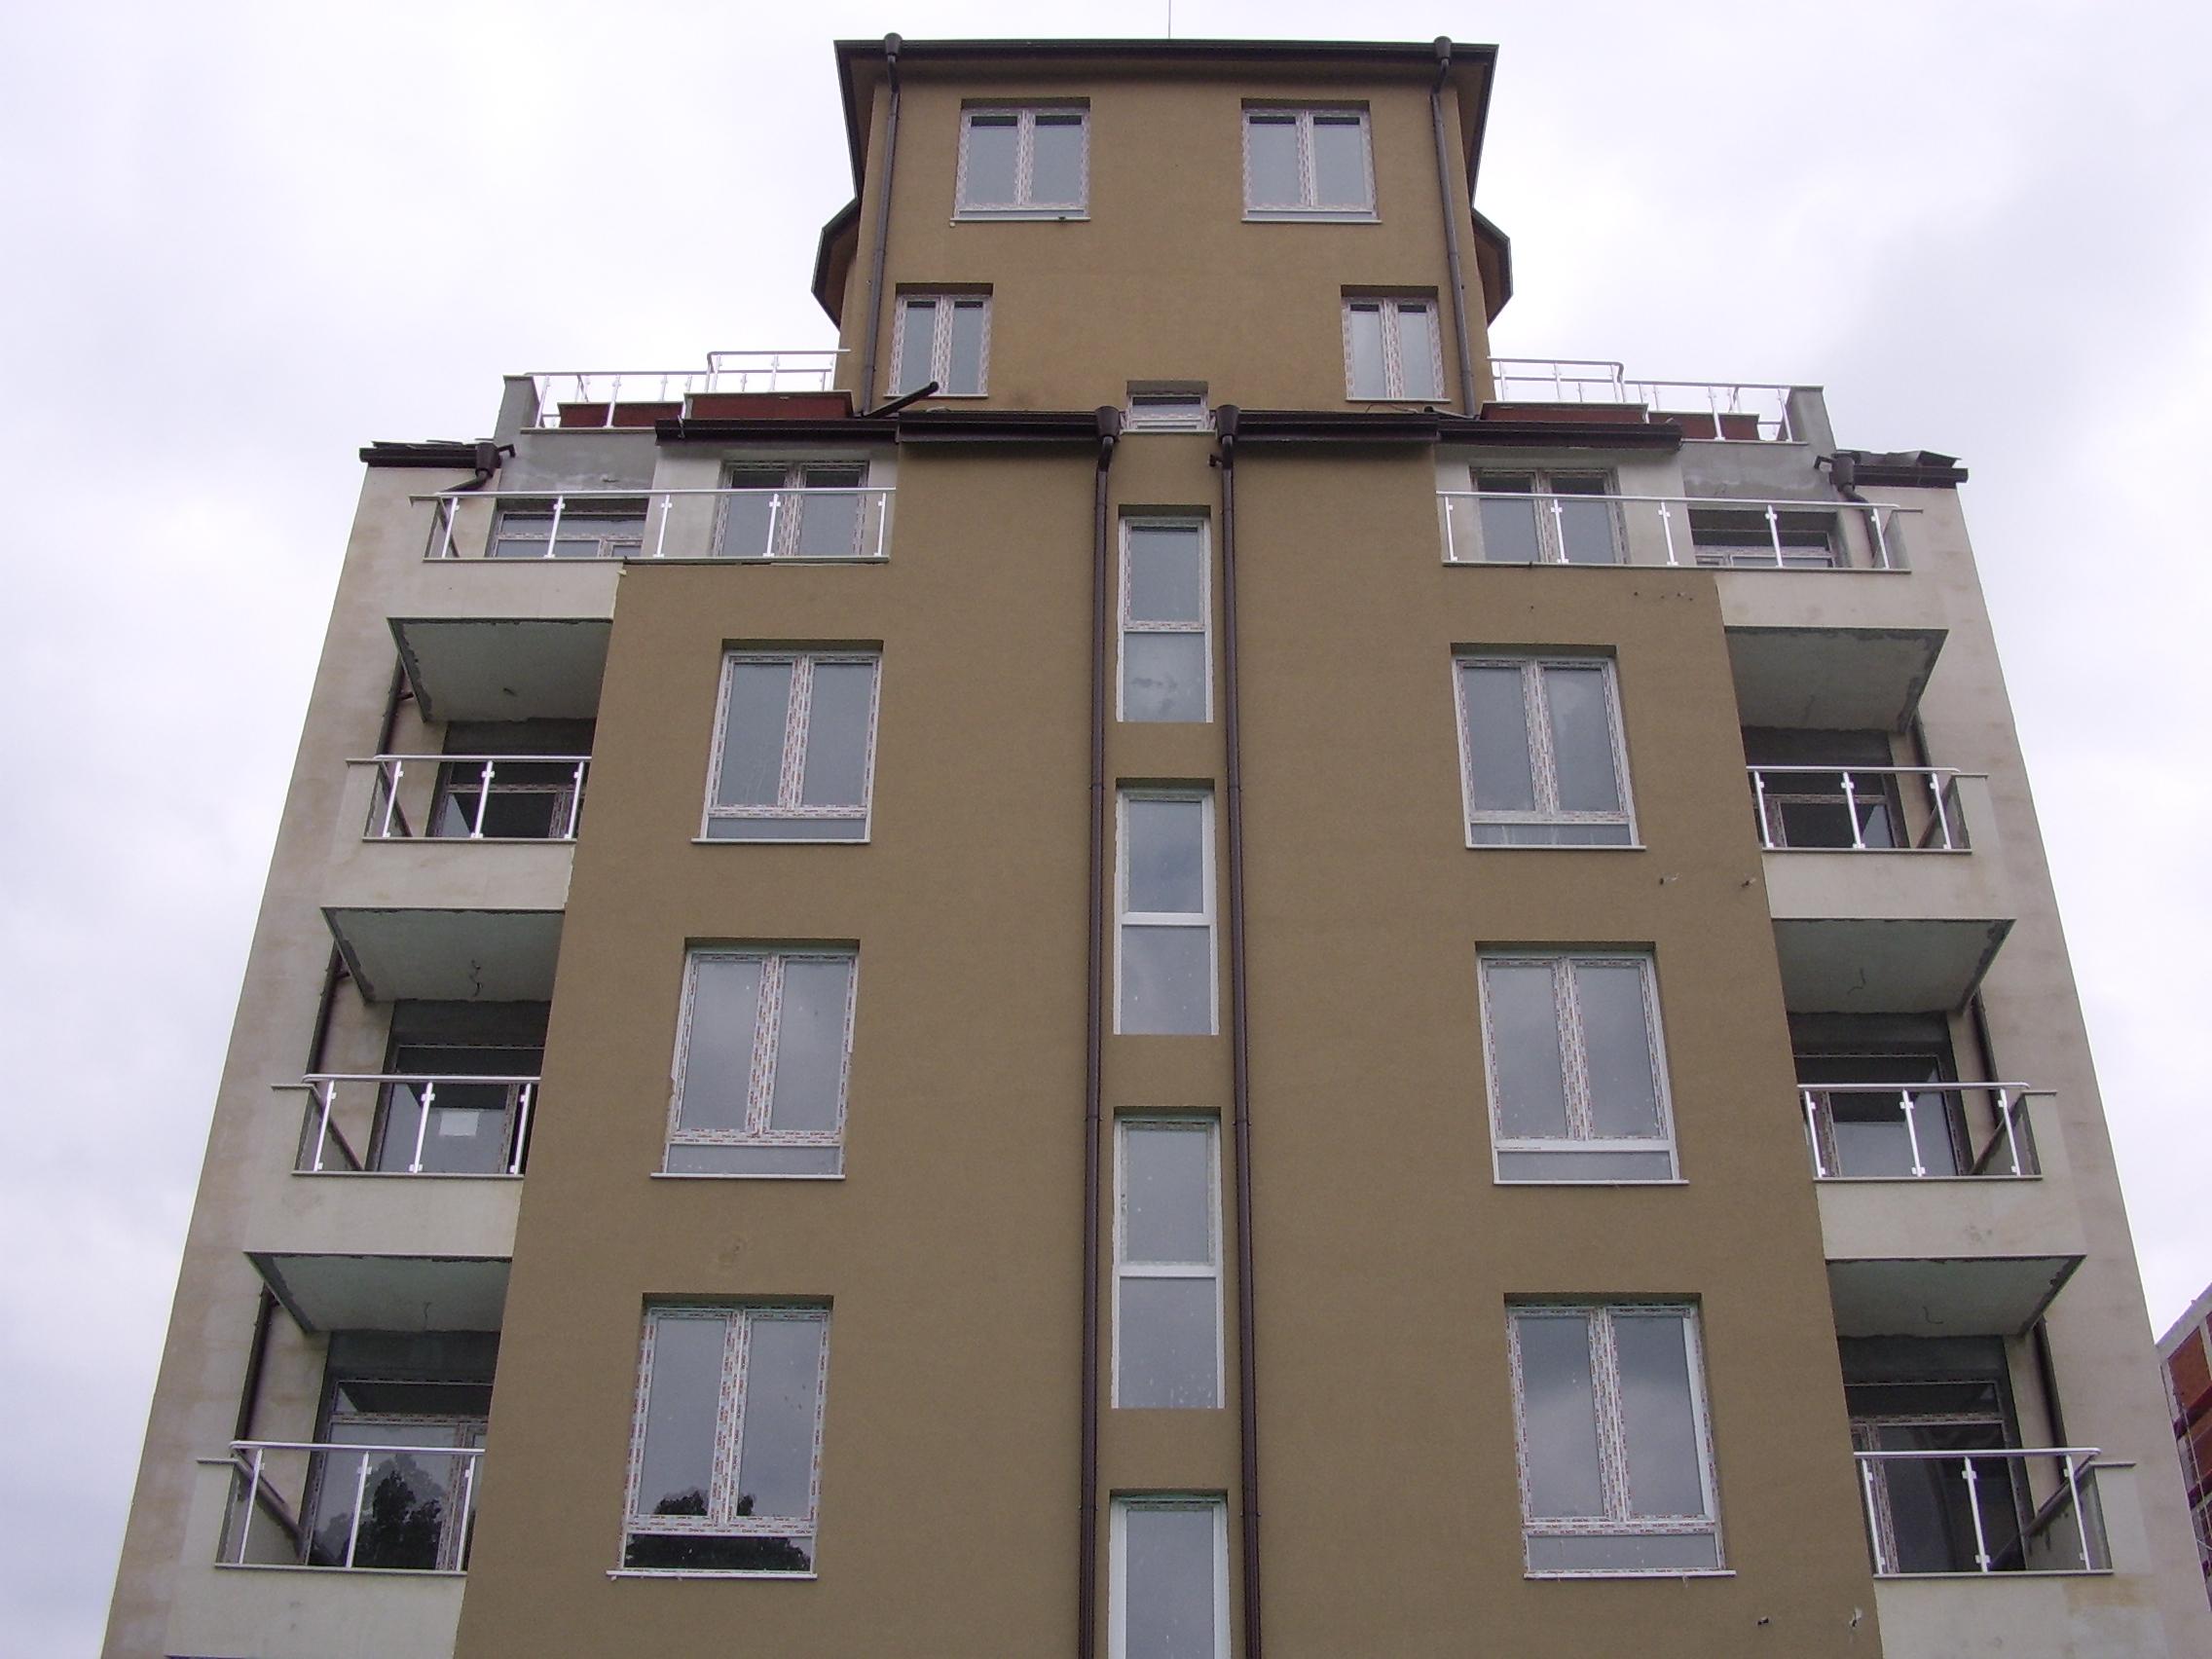 Aldomirovska